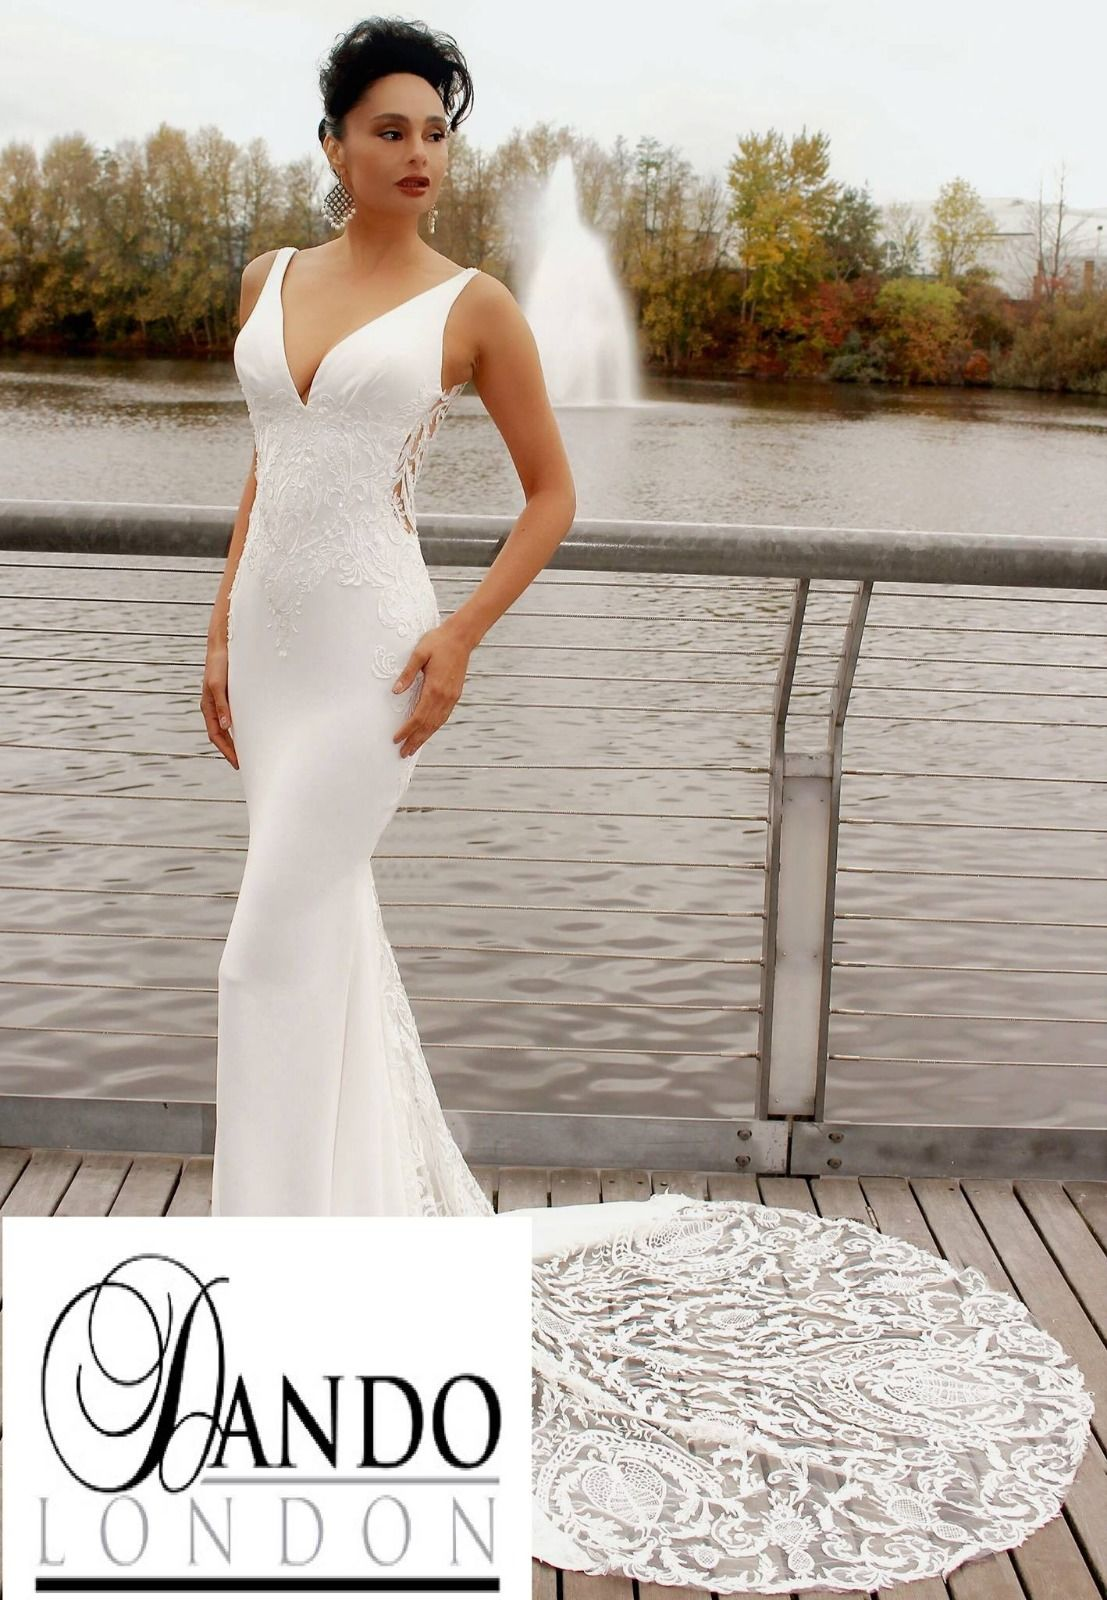 Dando London Bridals Lookbook